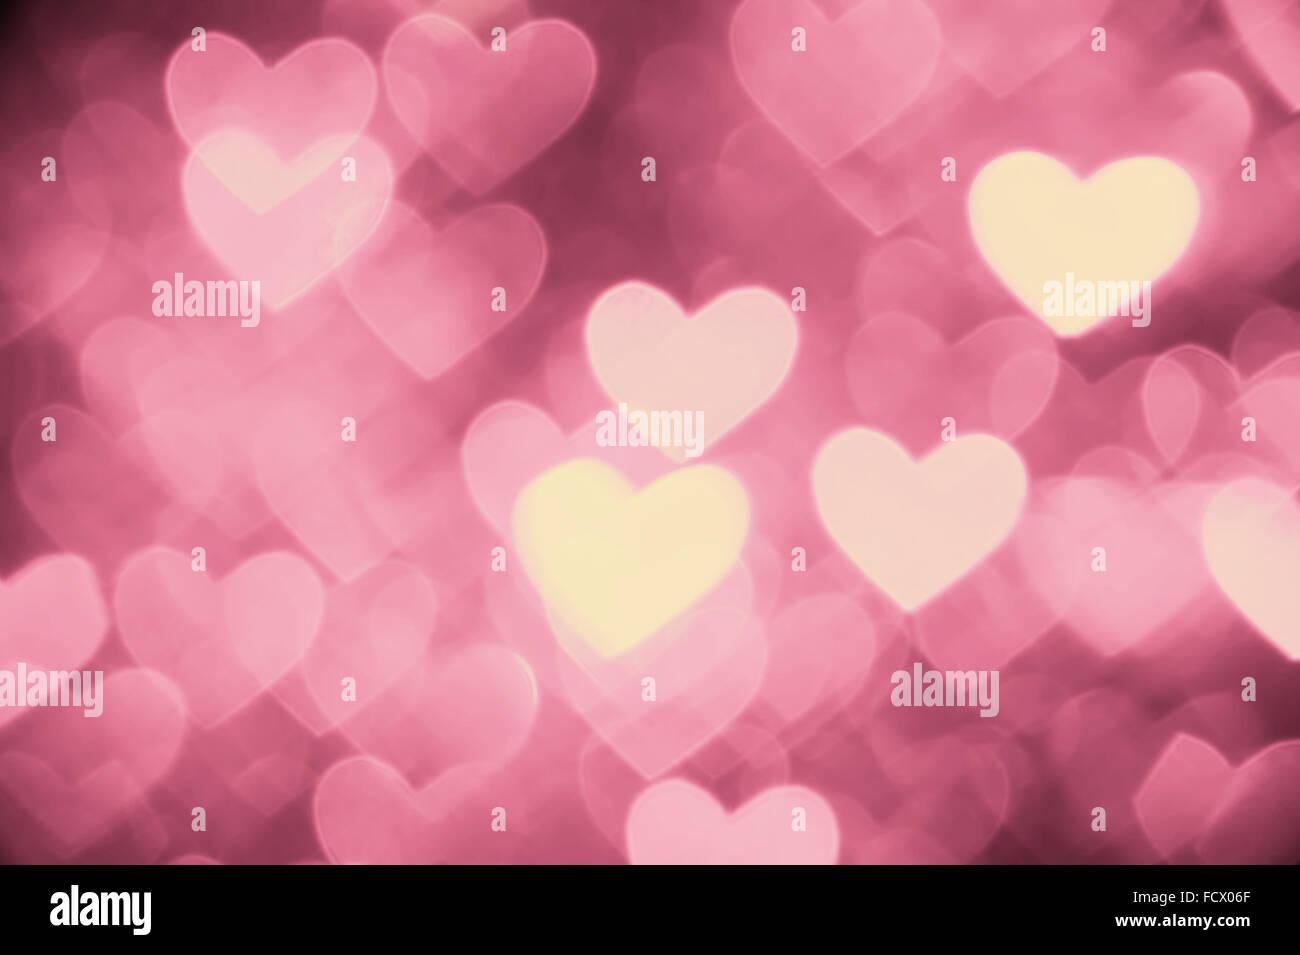 b236ae7423e8 heart background photo light pink color Stock Photo  93998647 - Alamy